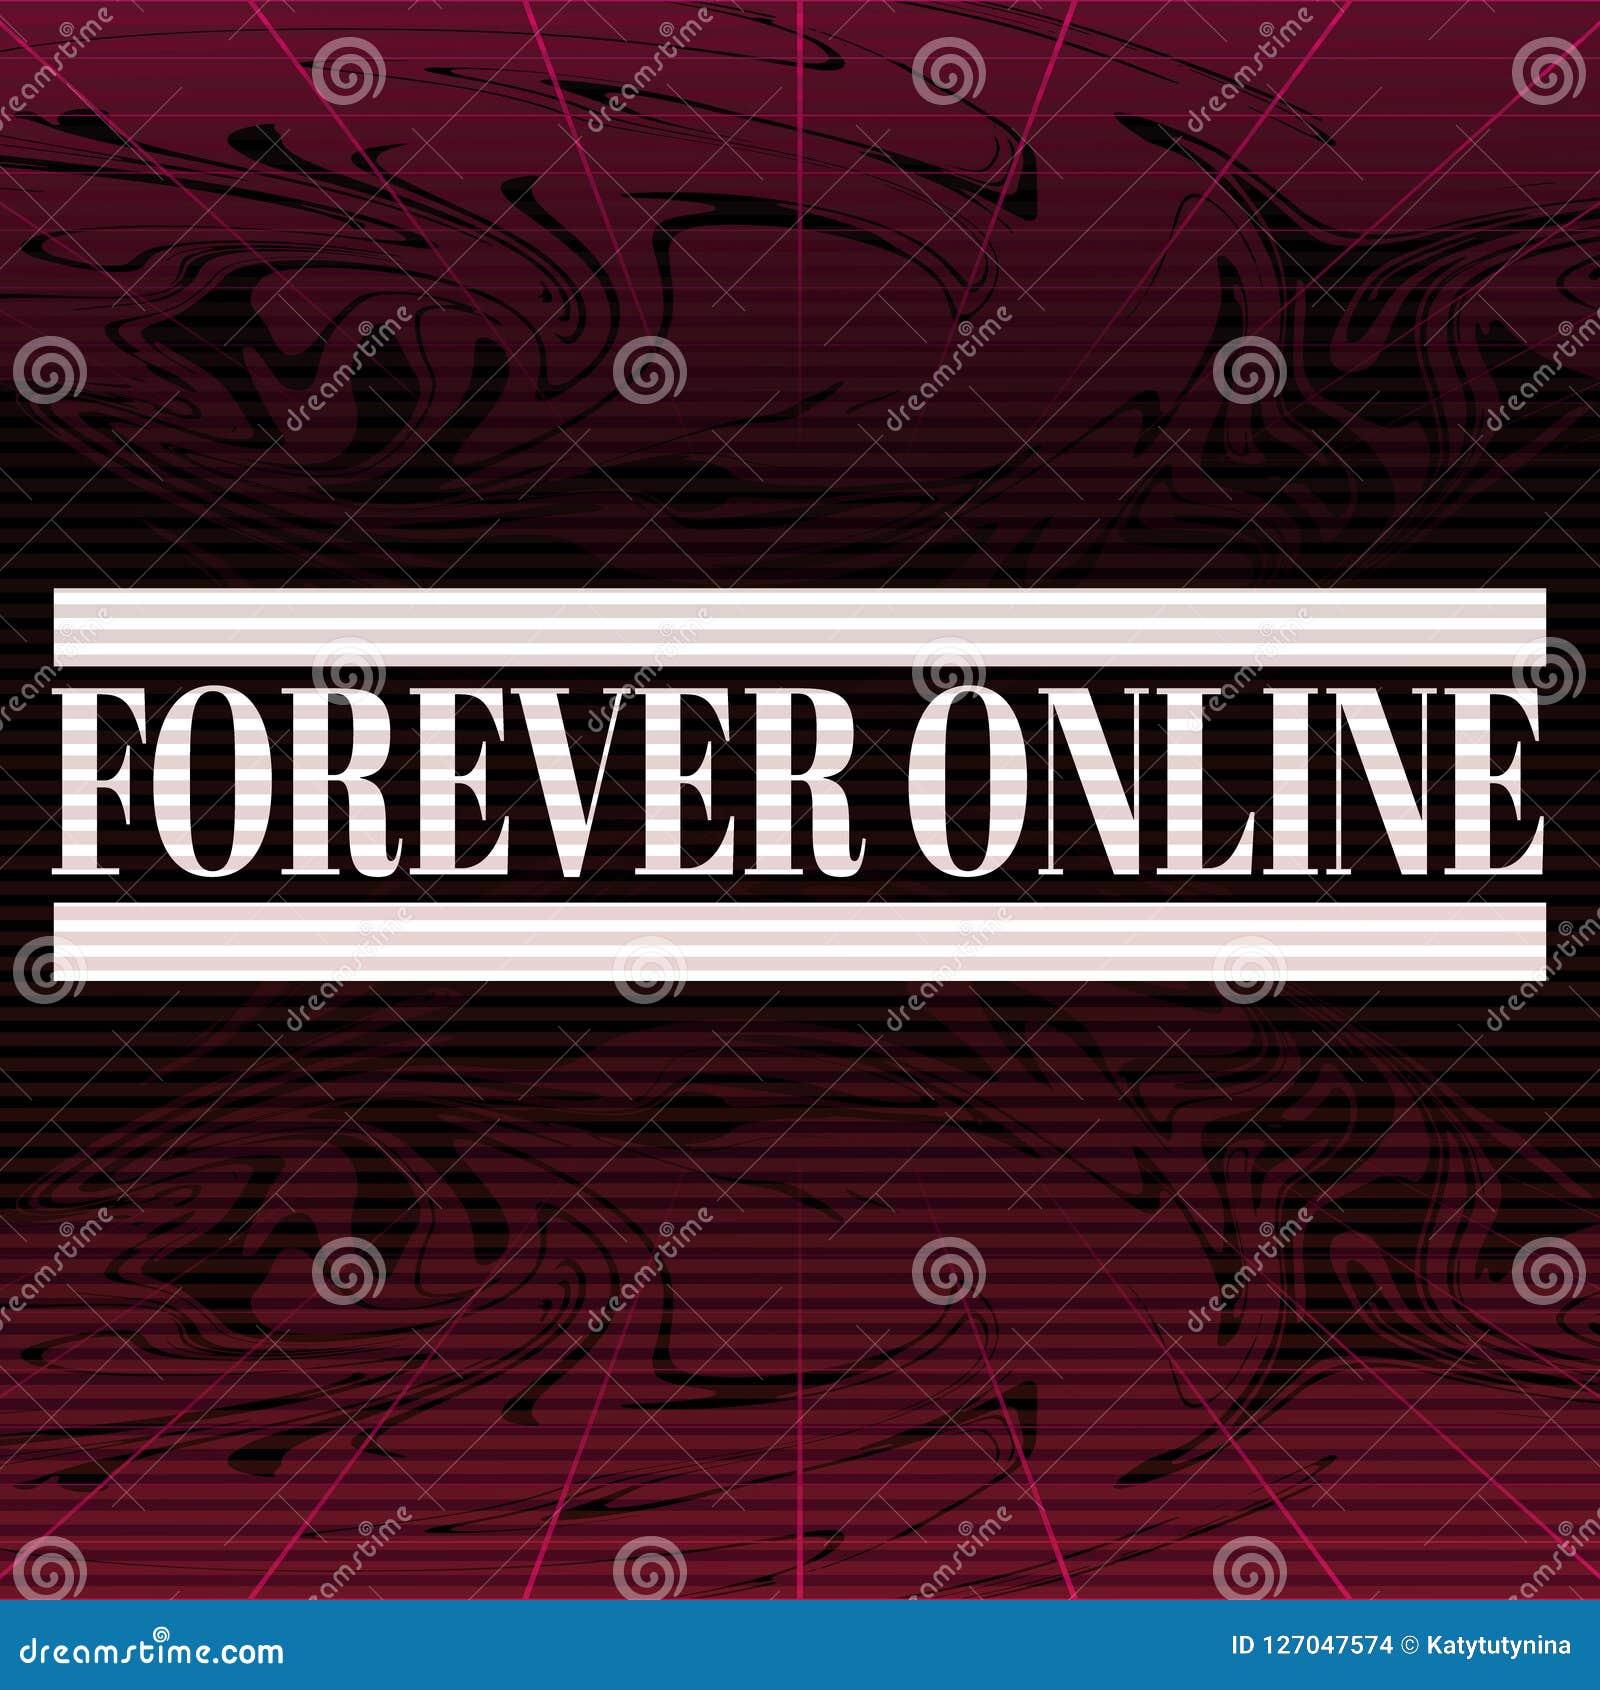 forever online vector poster made in vaporwave style stock vector